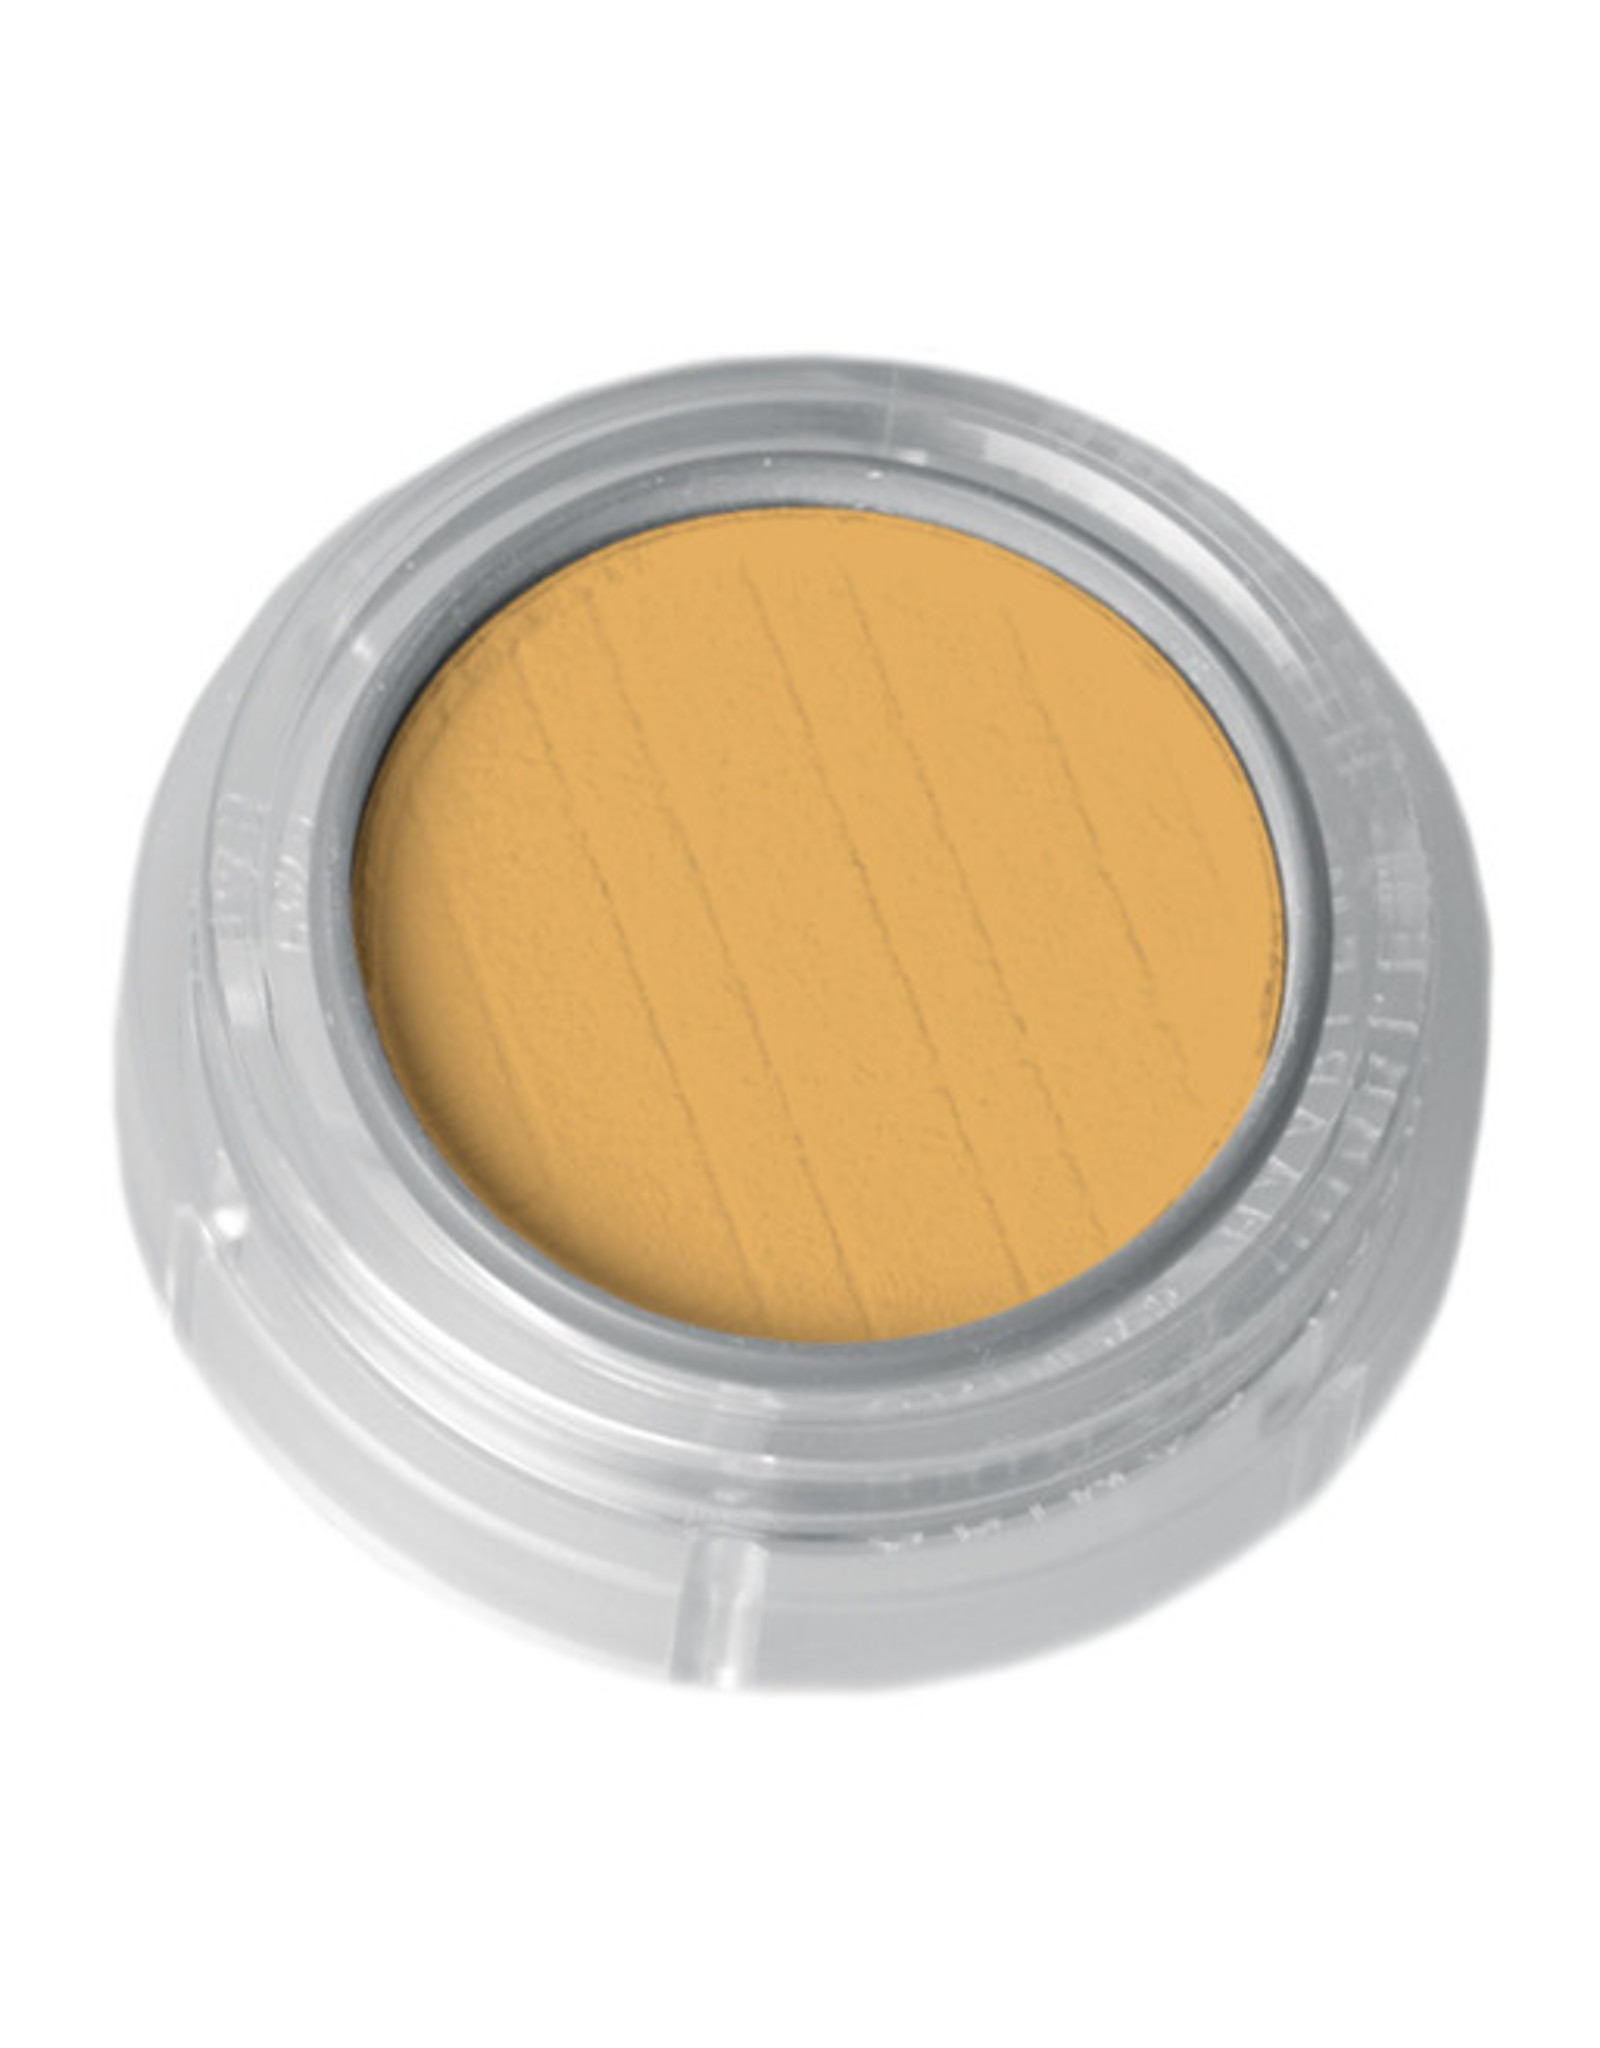 Grimas EYESHADOW/ROUGE 282 Oranjegeel A1 (2 g)